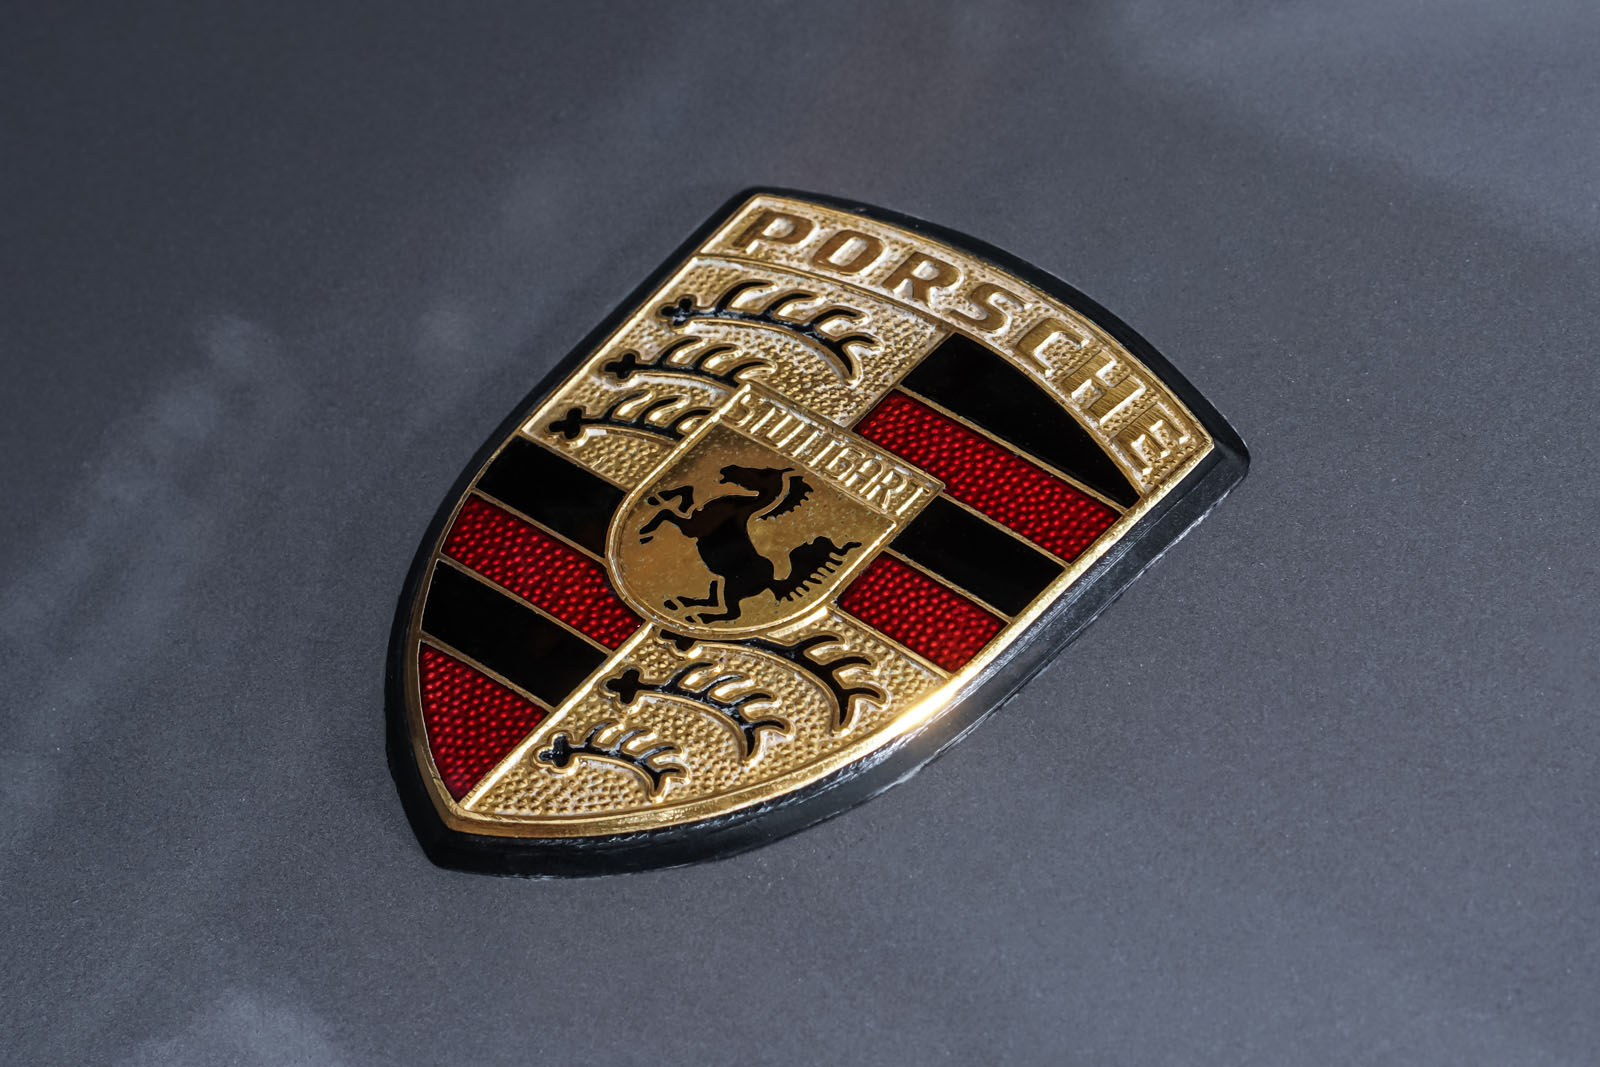 Porsche_928_Grau_Schwarz_POR-0325_11_w